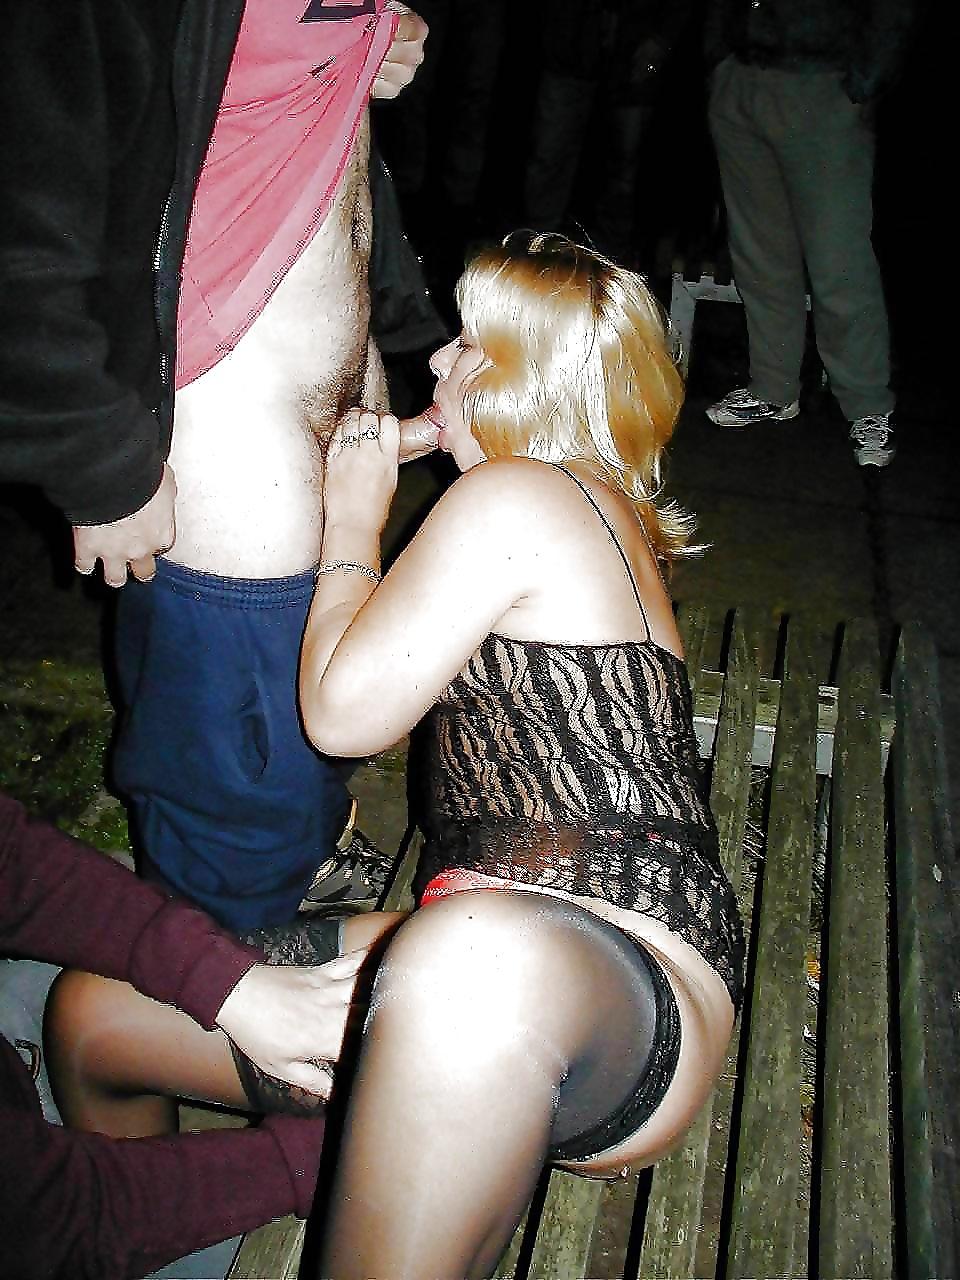 The british sex in public asian lesbian